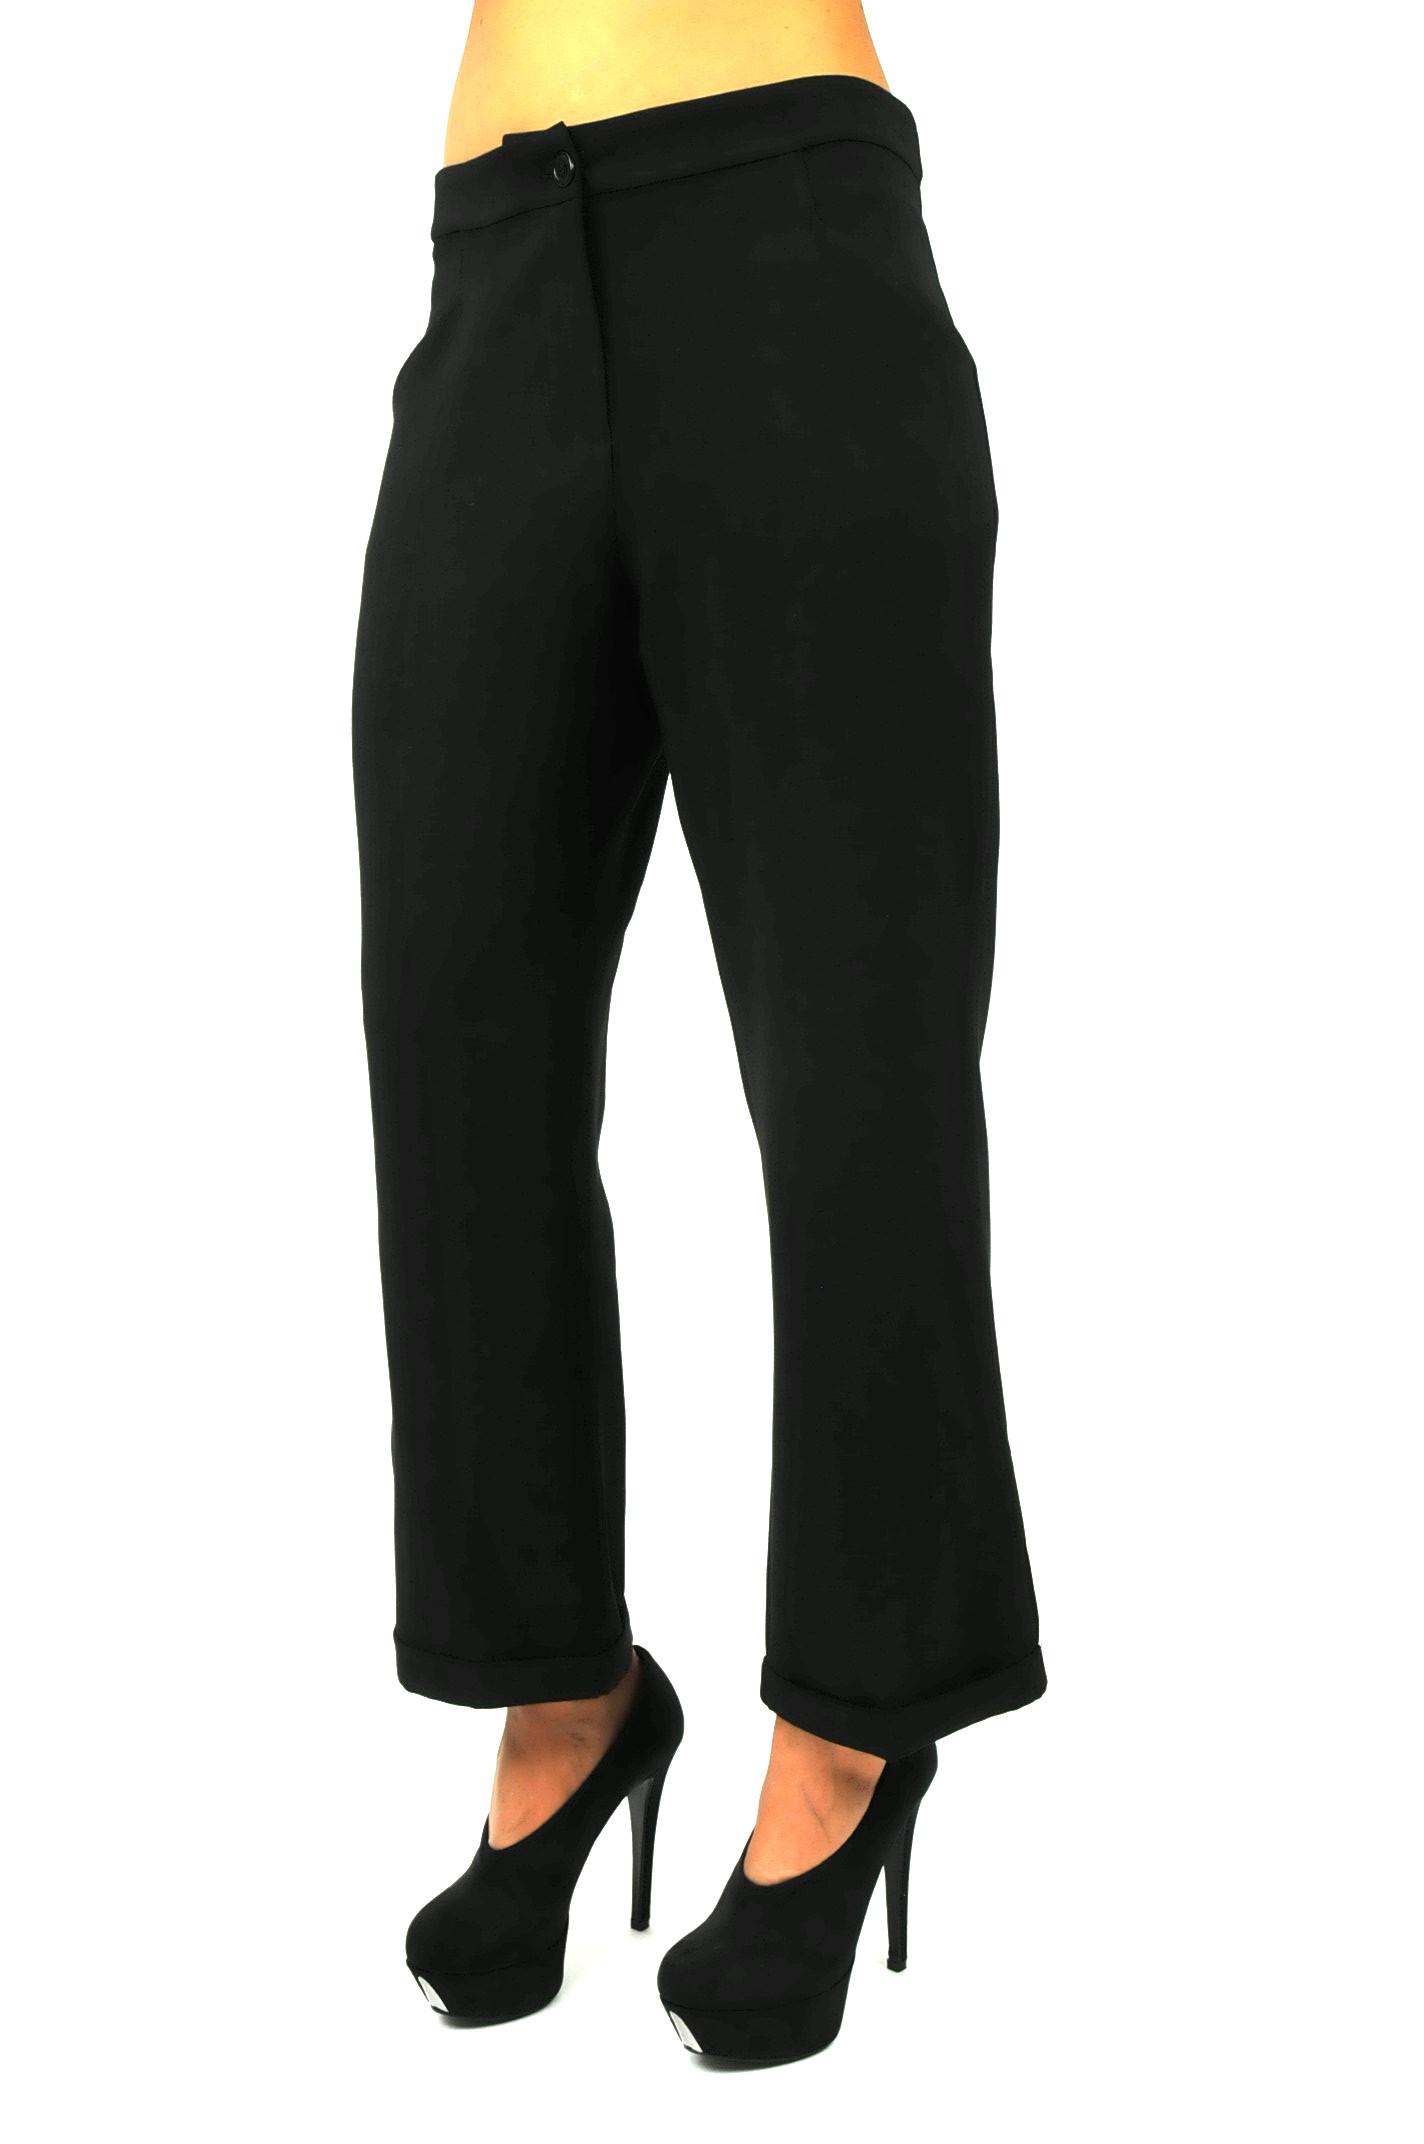 1ee678f8f27632 Pantalone elegante donna di Please - Pantaloni Donna | Uplà